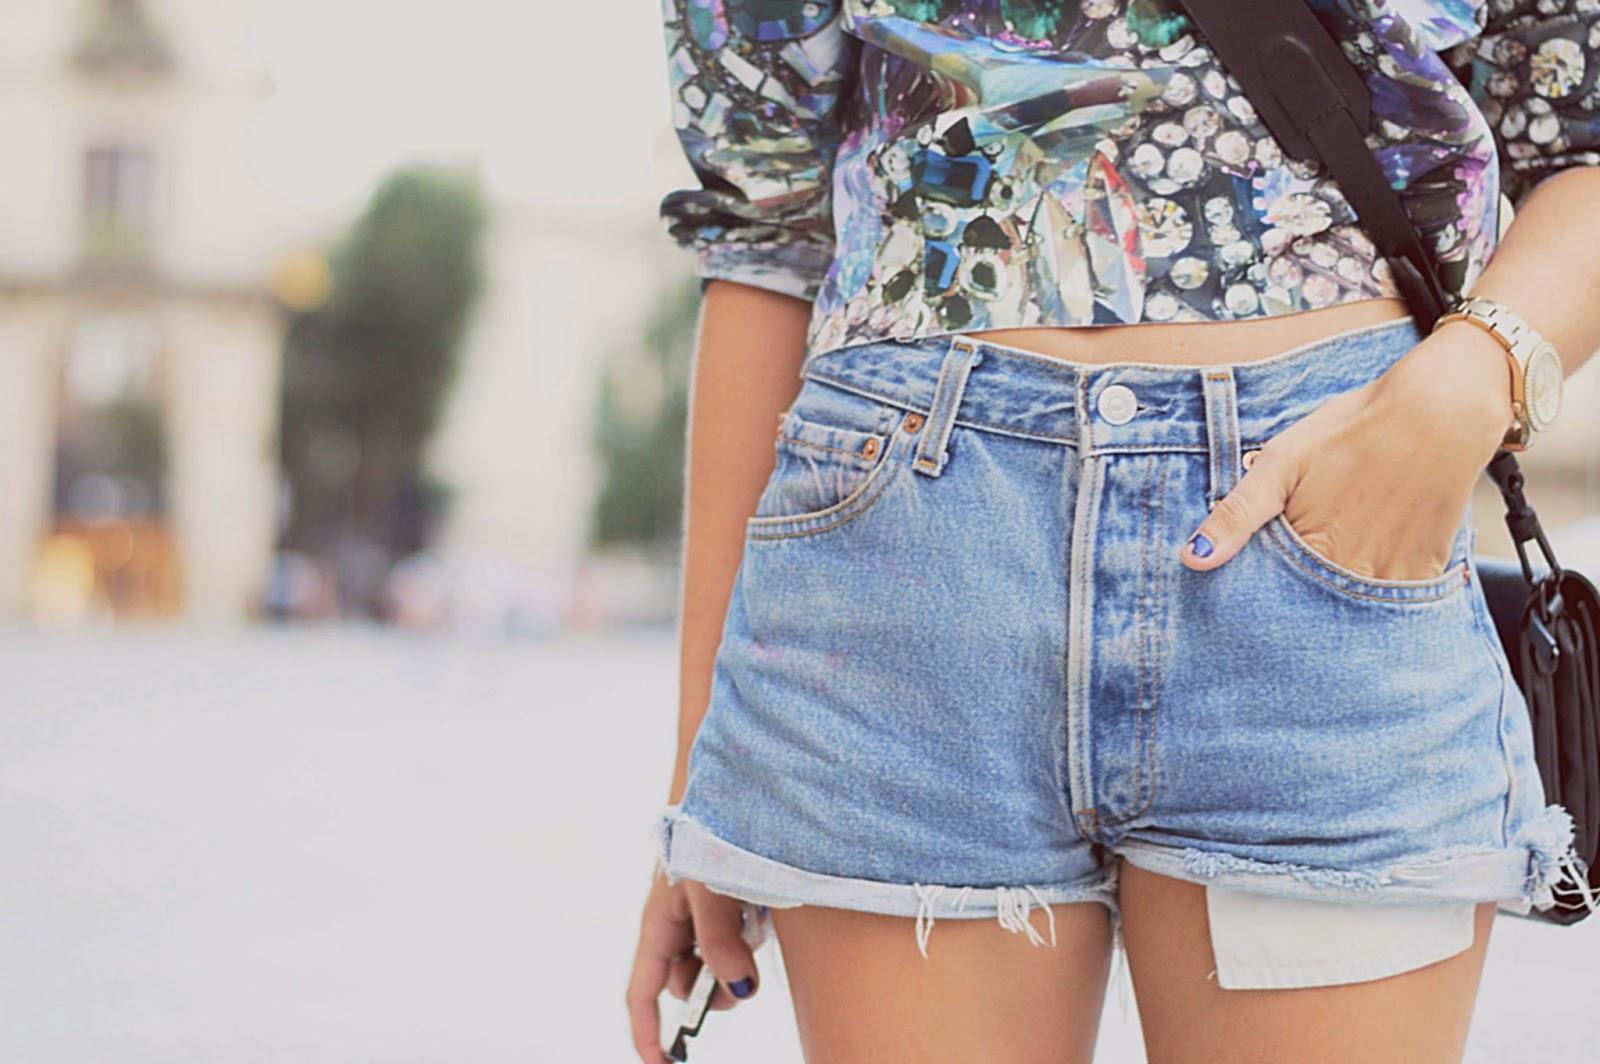 sudadera H&M, bolso H&M, sandalias sommers, shorts vintage Levi's